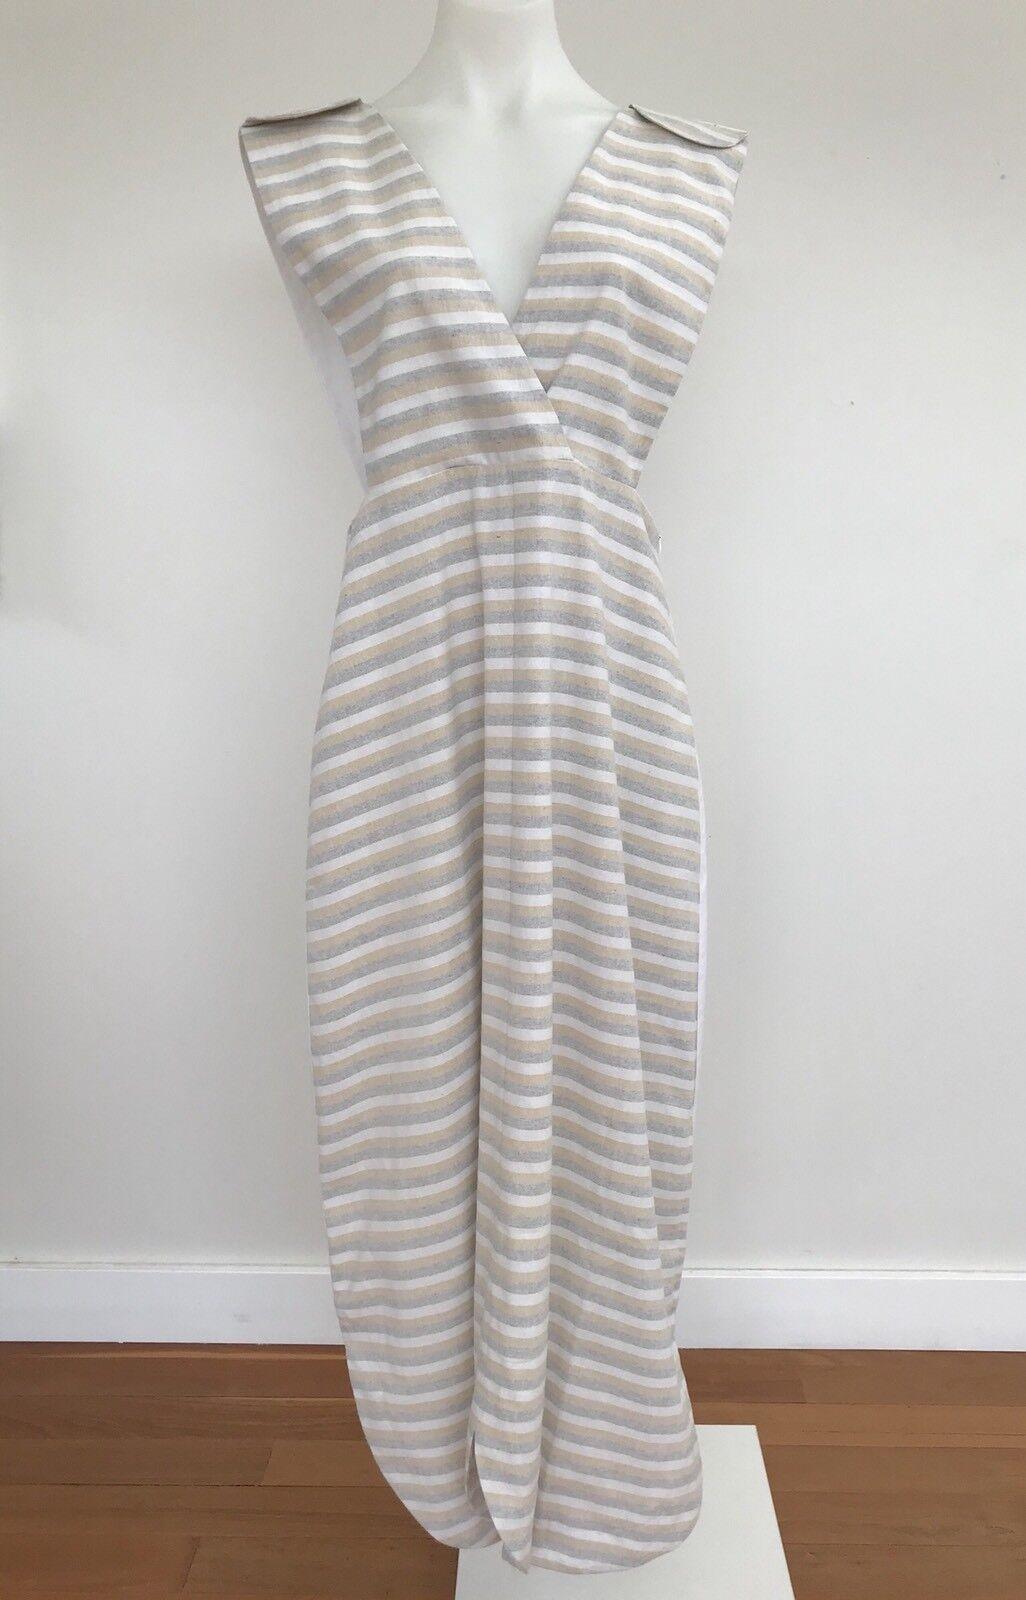 ALPHA60 ALPHA 60 Striped Cotton Pinafore Dungaree Dress Größe L